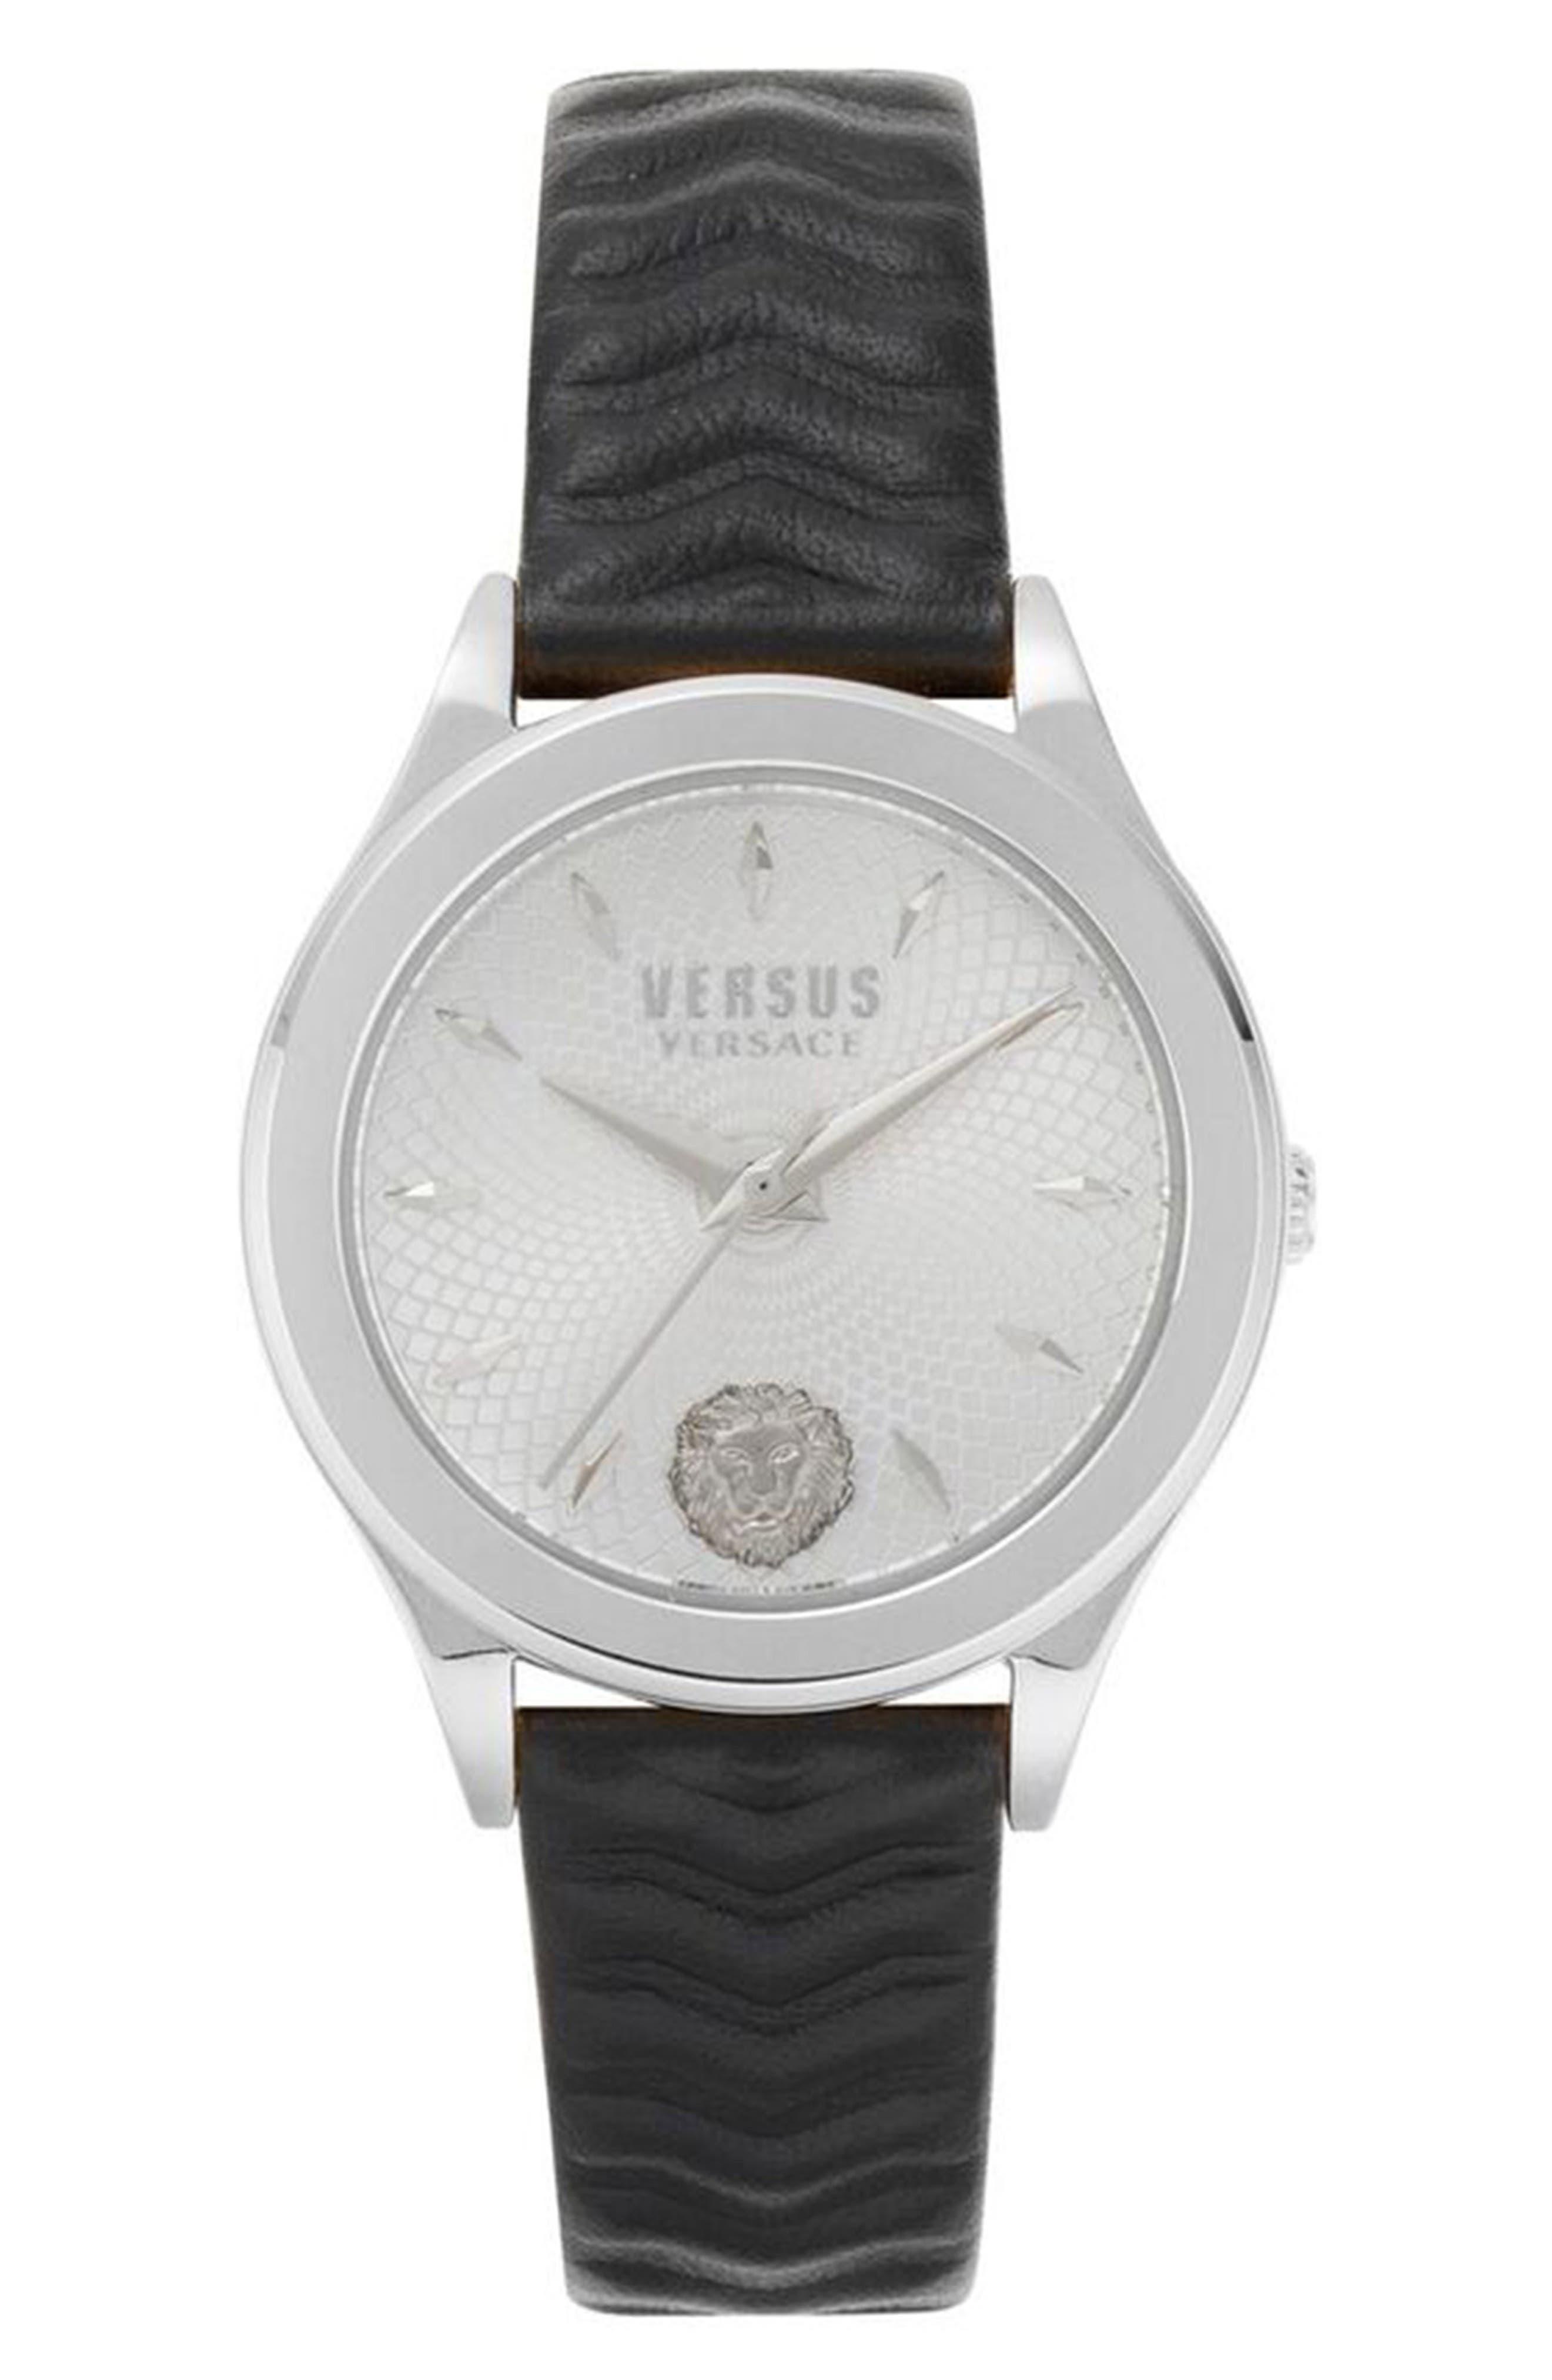 VERSUS VERSACE Mount Pleasant Leather Strap Watch, 34mm, Main, color, BLACK/ SILVER